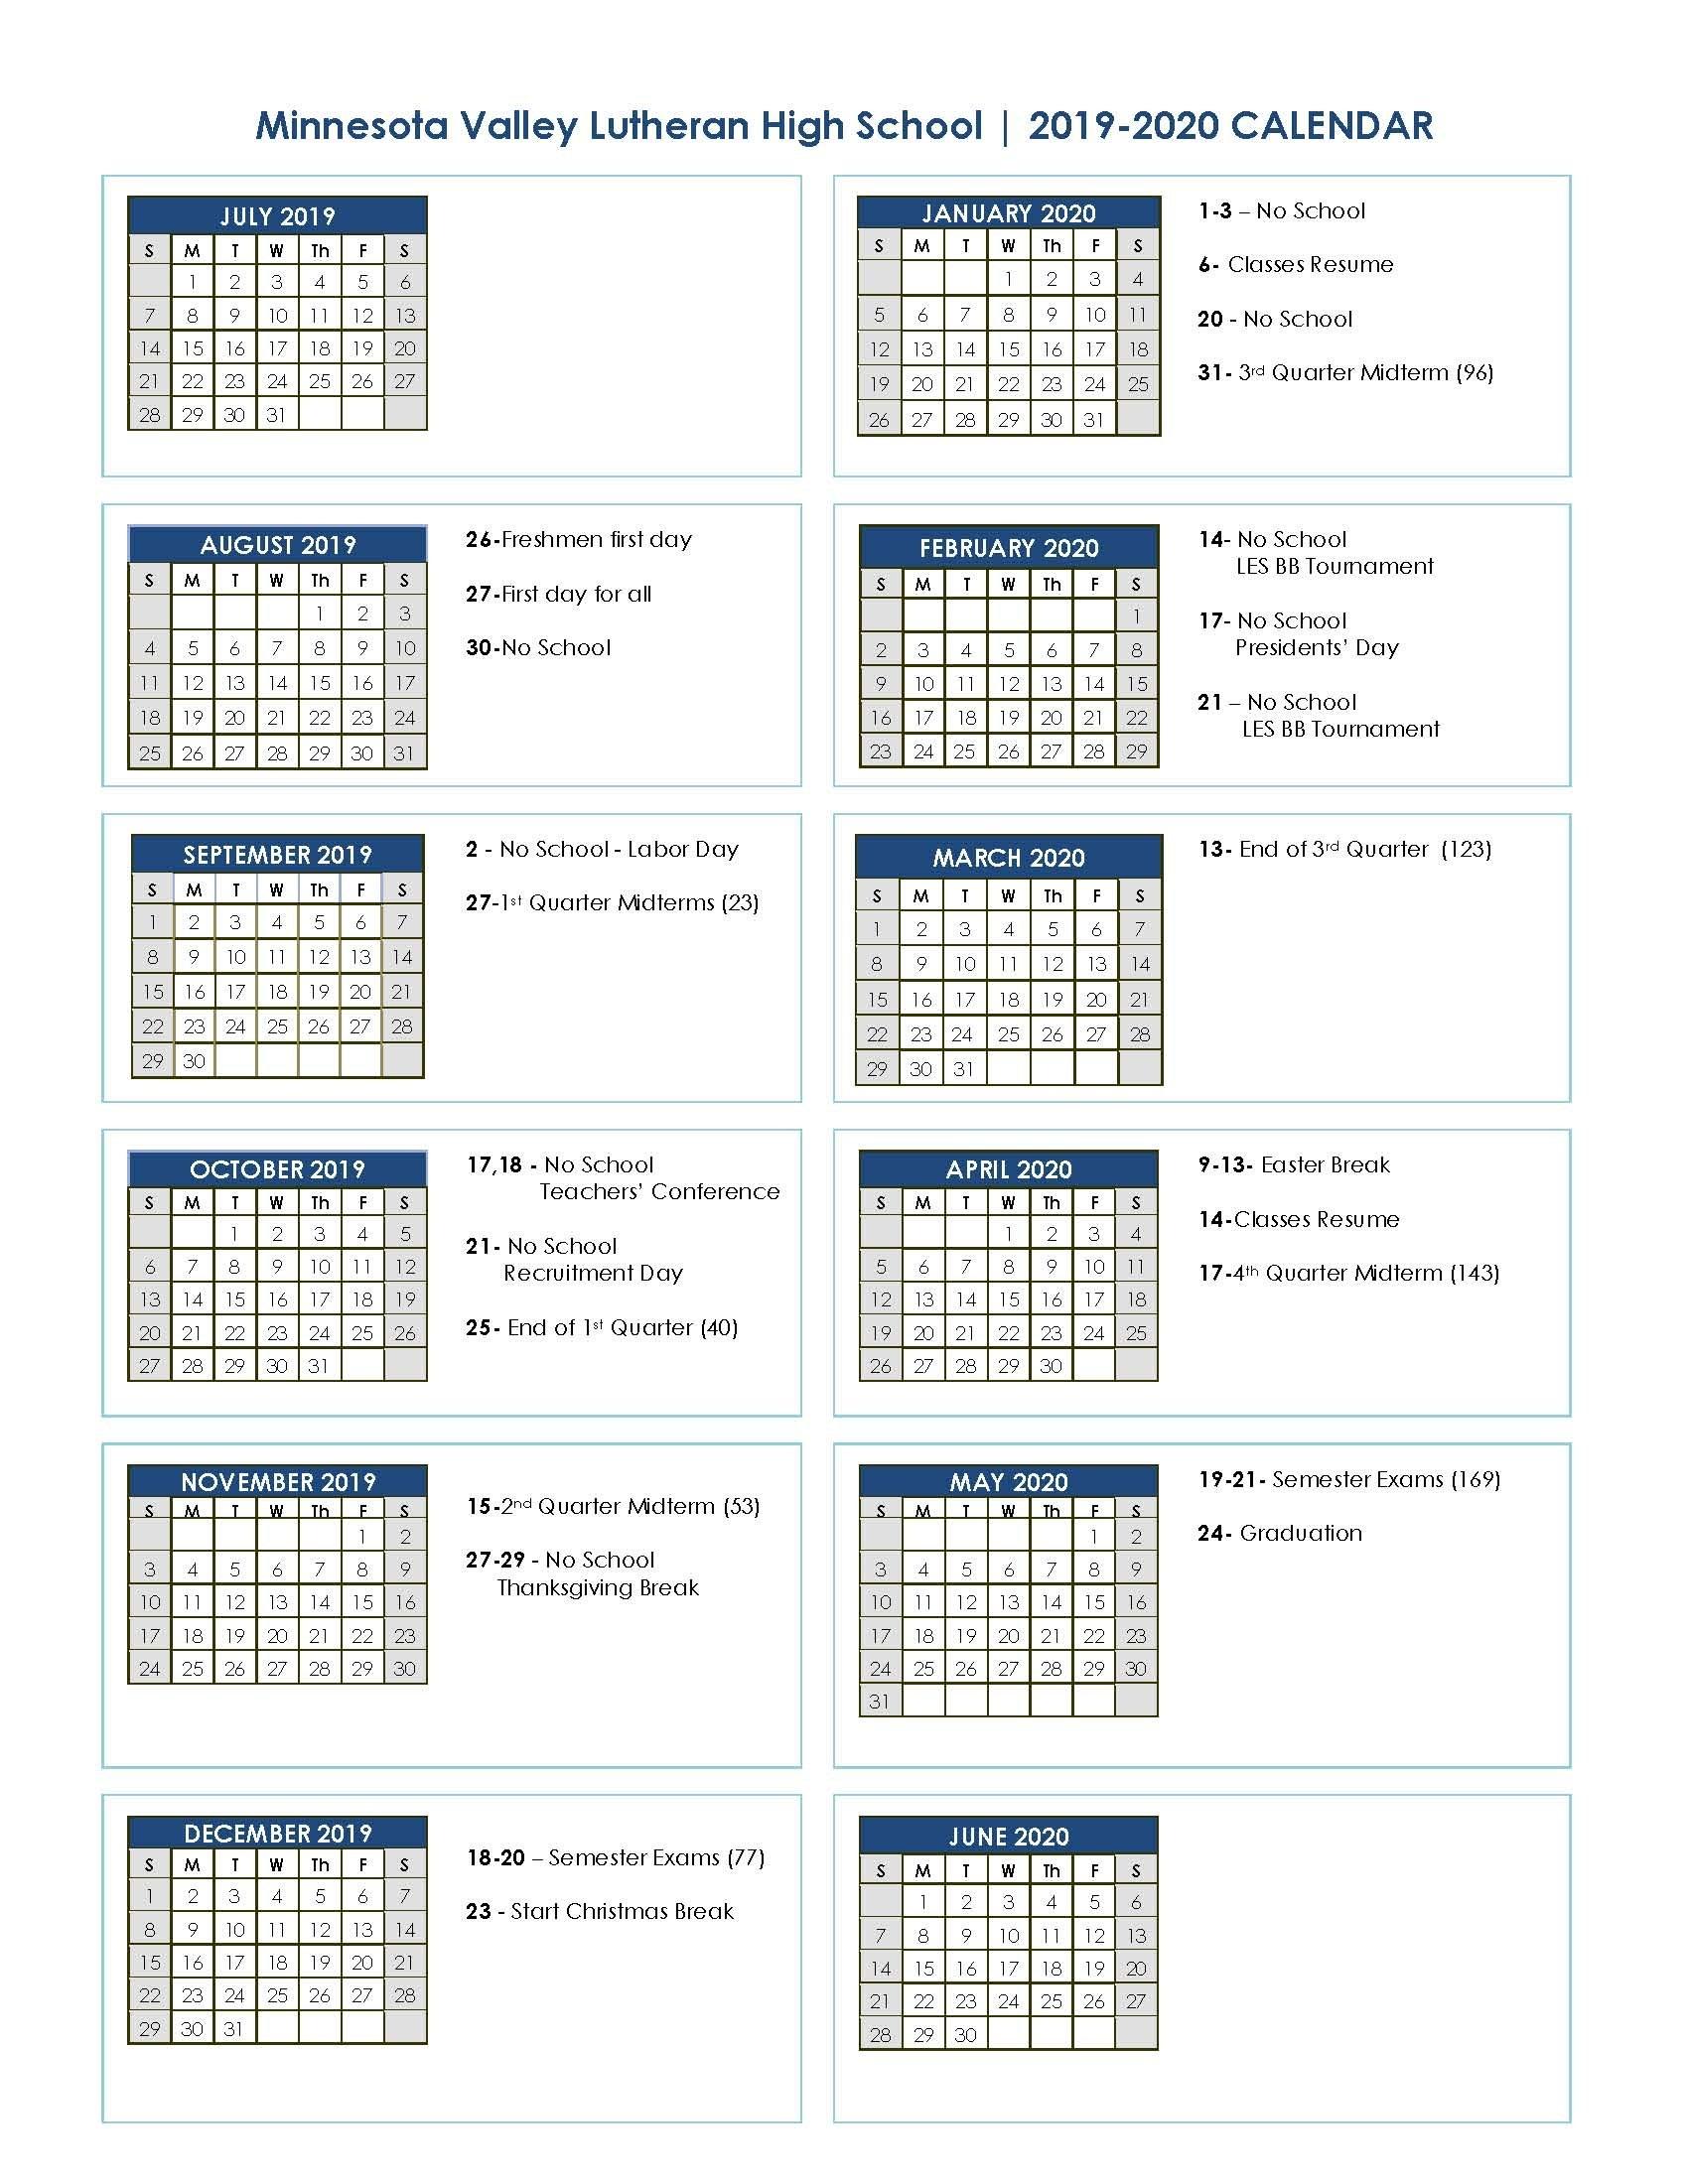 Academic Calendar 2019-2020 | Minnesota Valley Lutheran High School 3 Term Calendar 2019